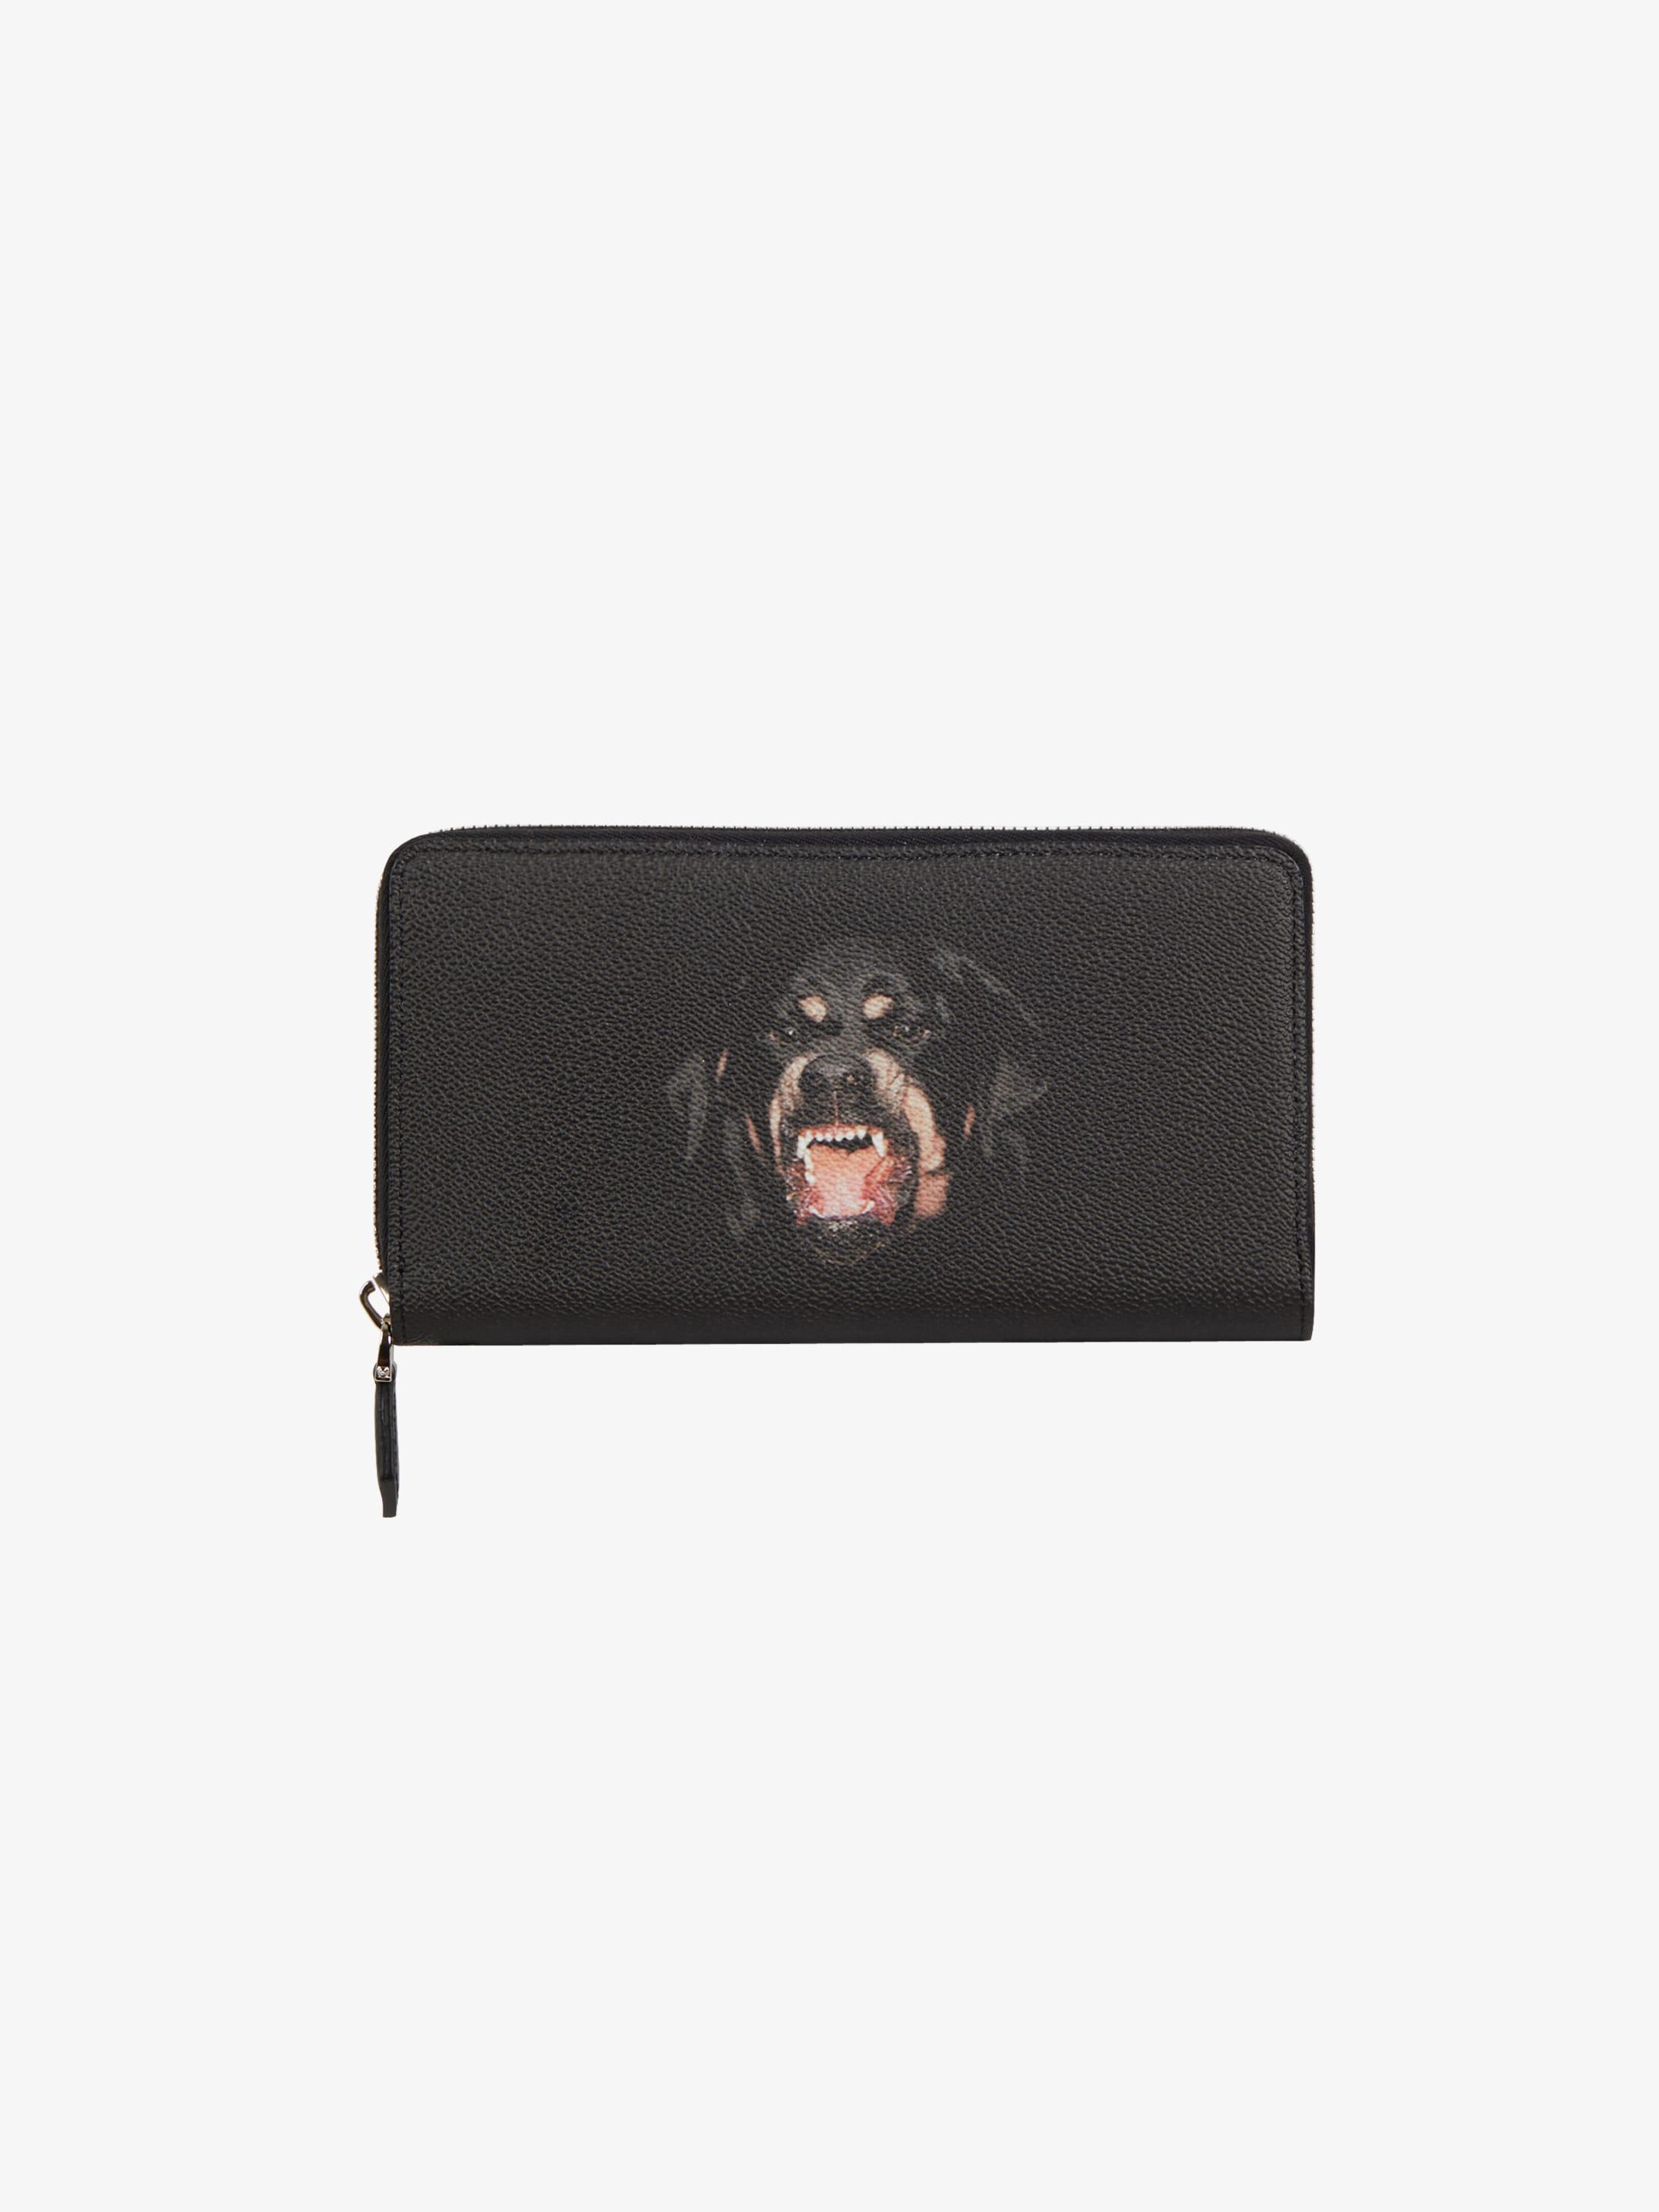 Rottweiler printed long zipped wallet